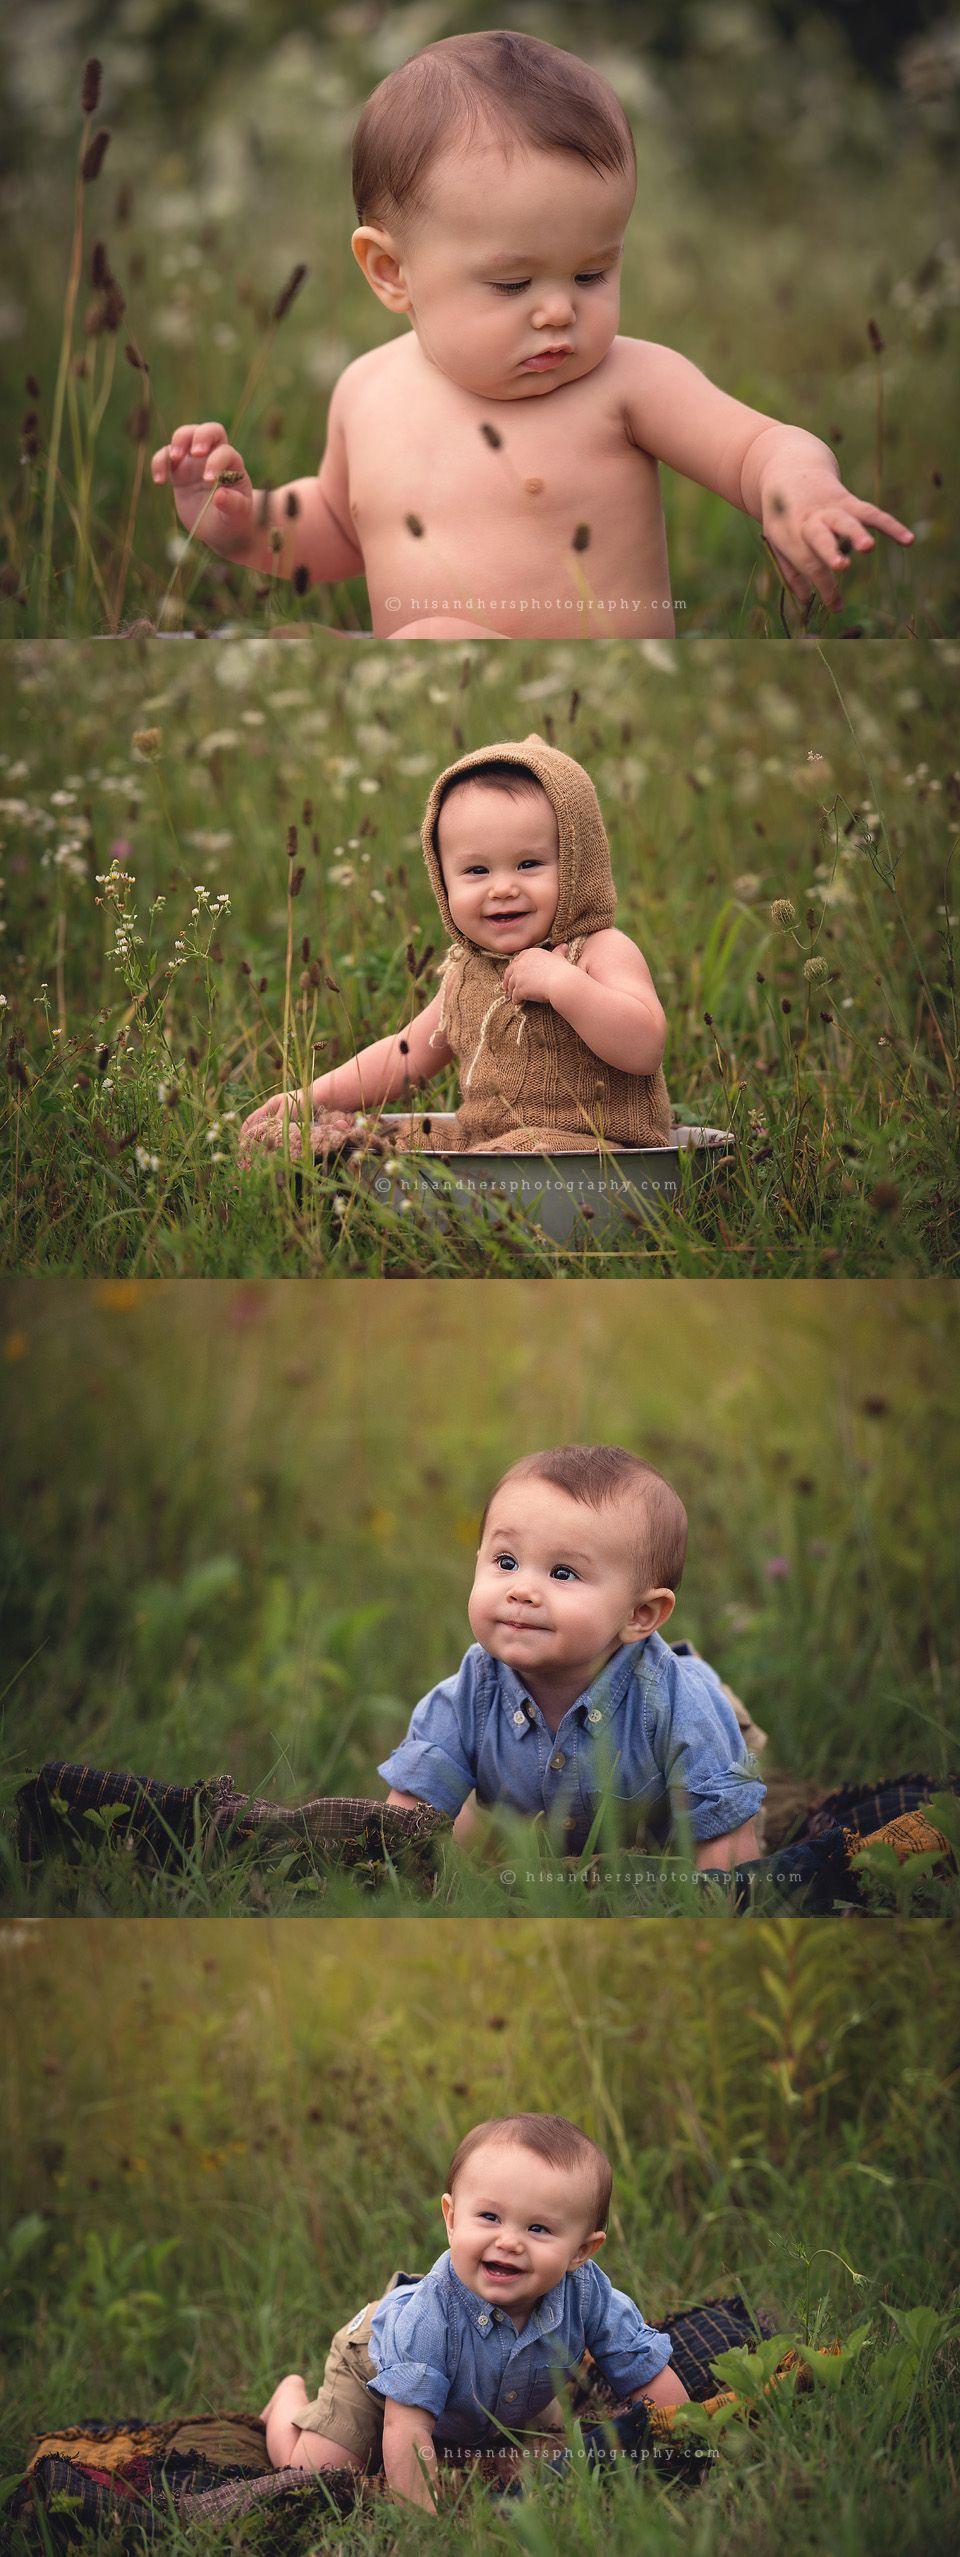 des moines iowa baby photographer 6 7 8 9 months sitting session iowa photographer